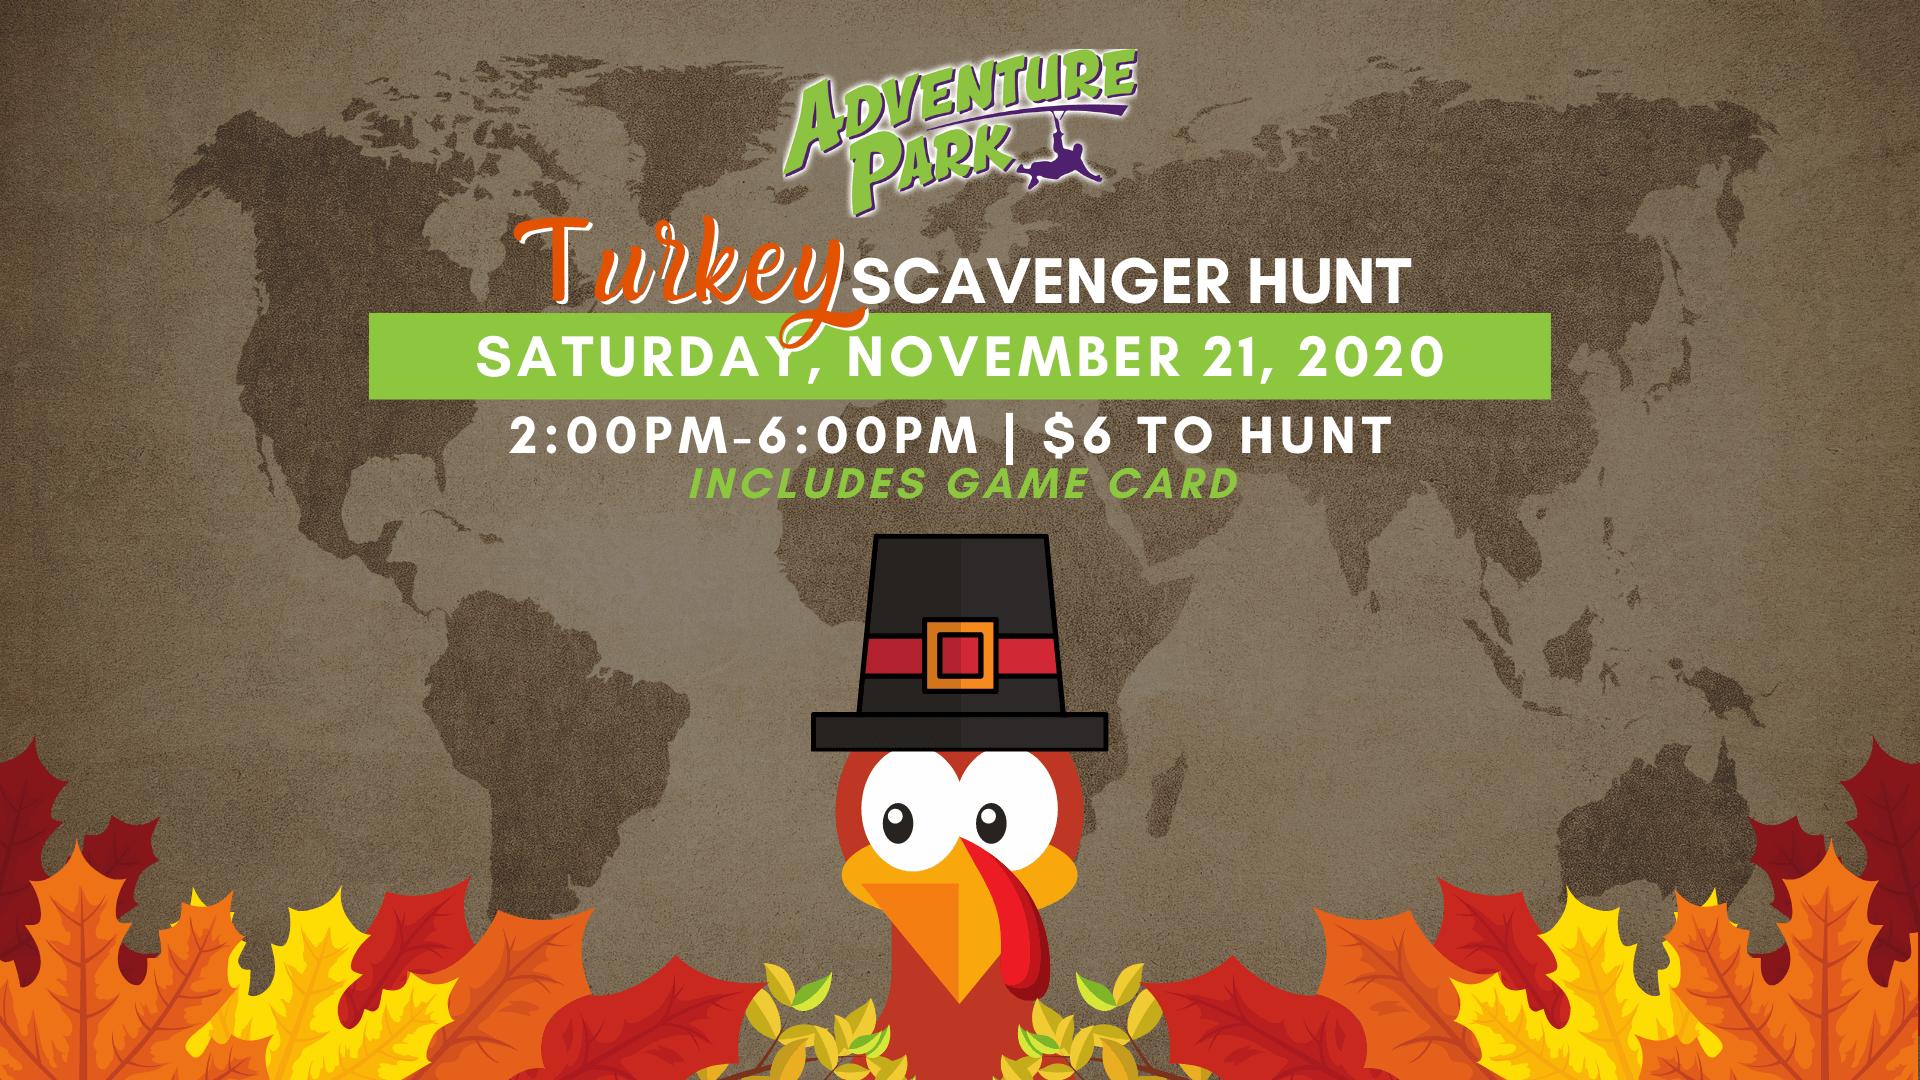 Turkey Scavenger Hunt